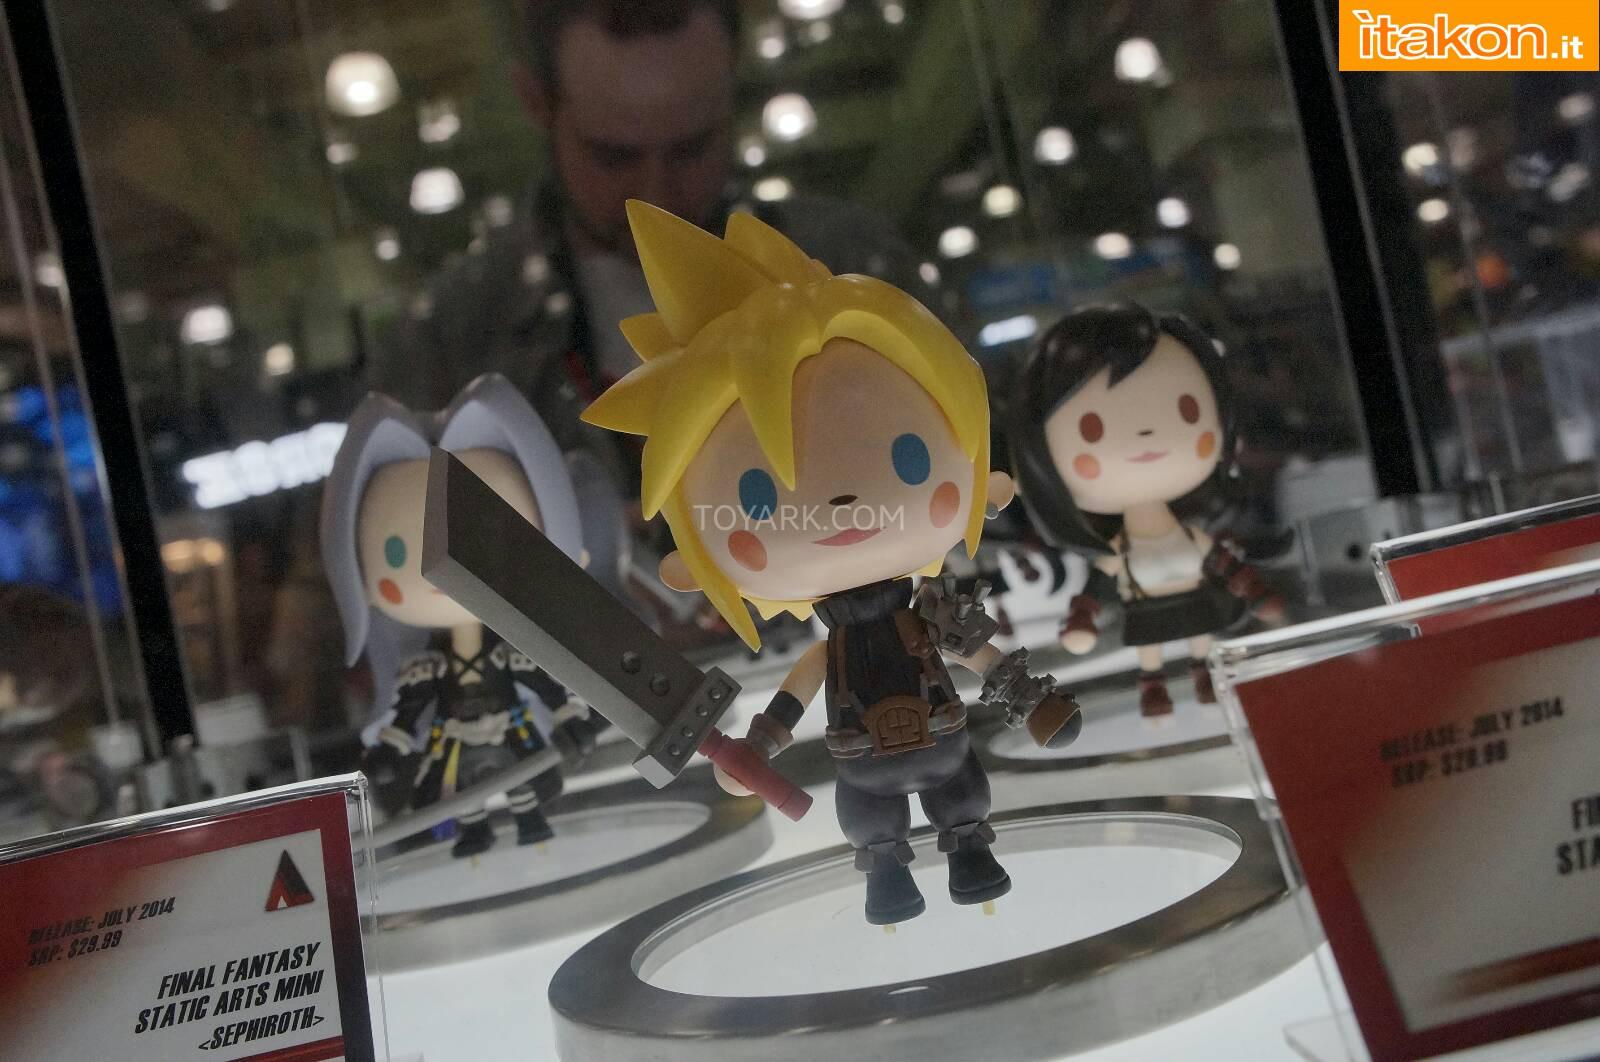 Link a Toy-Fair-2014-Square-Enix-Final-Fantasy-Static-Arts-003